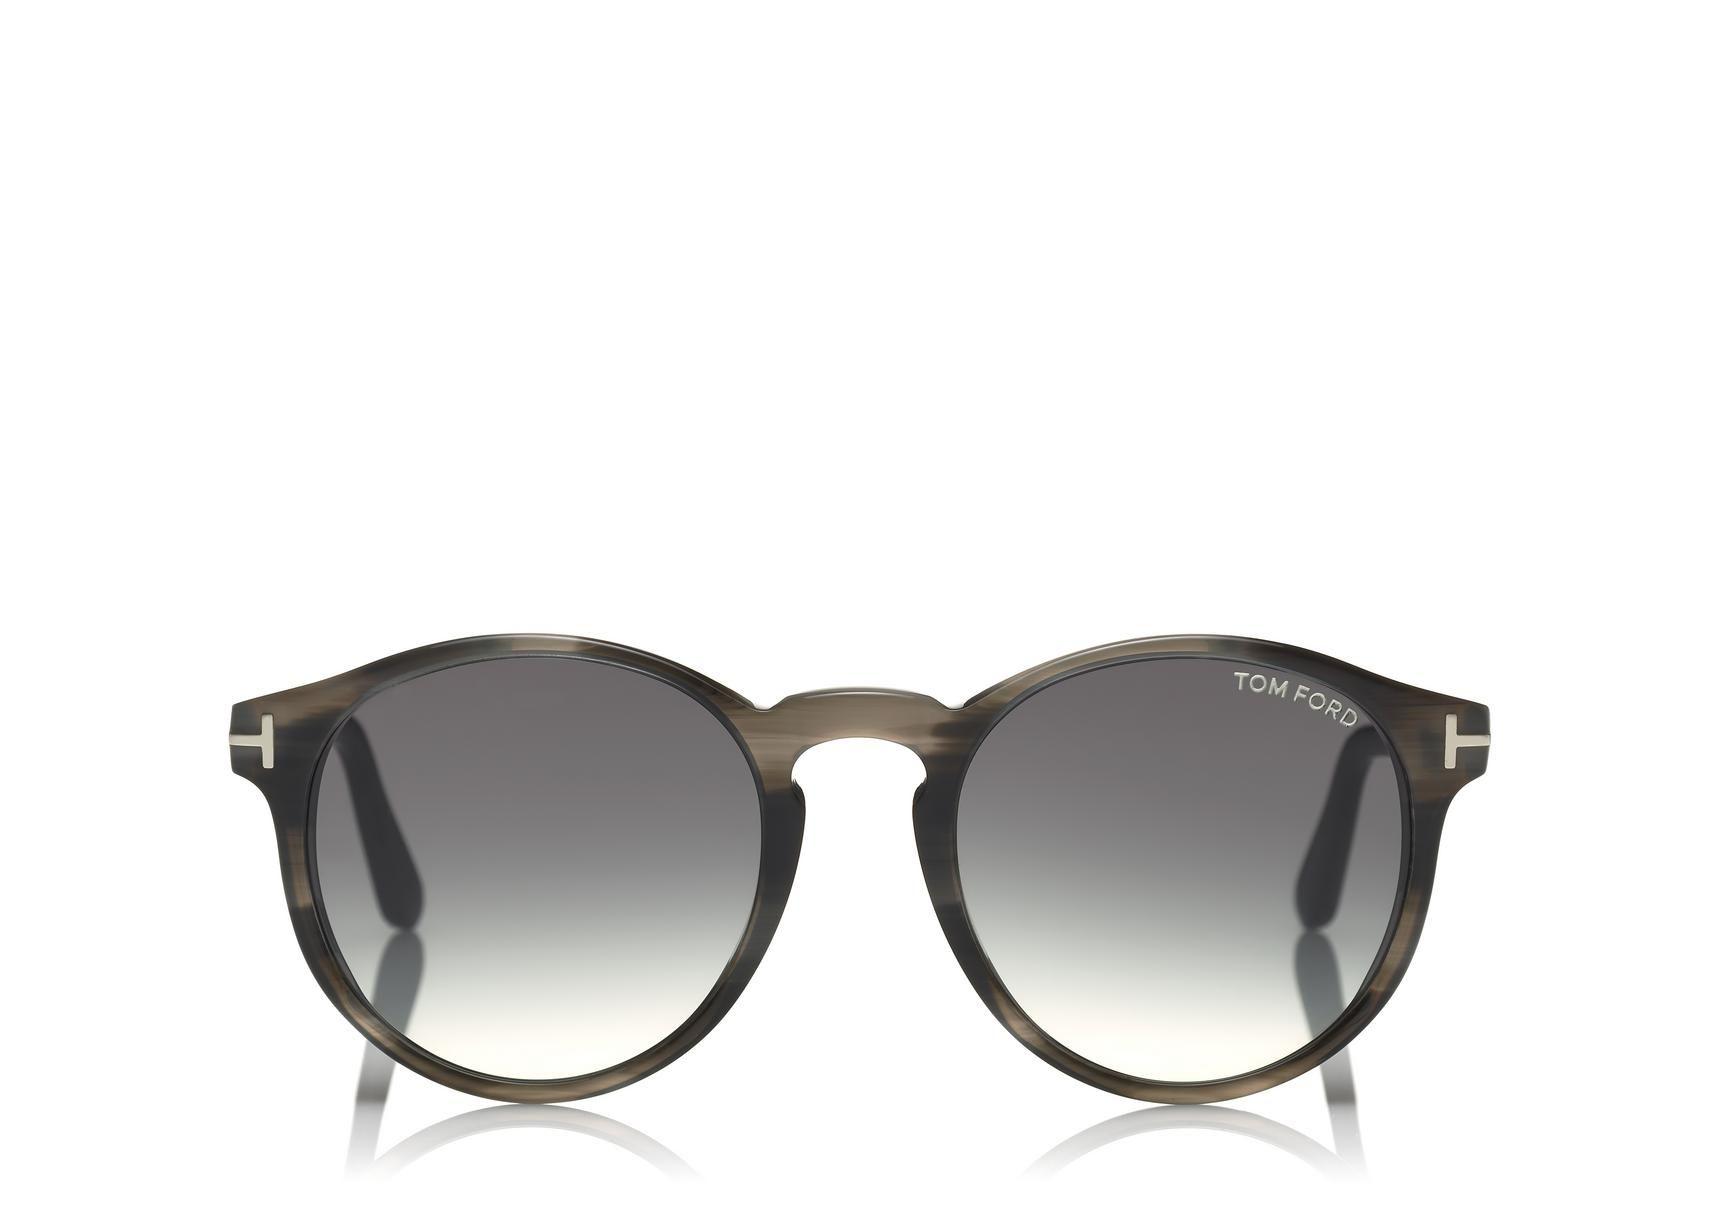 51df82e9692c3a Tom Ford IAN SUNGLASSES - Men   TomFord.com   wardrobe wants ...